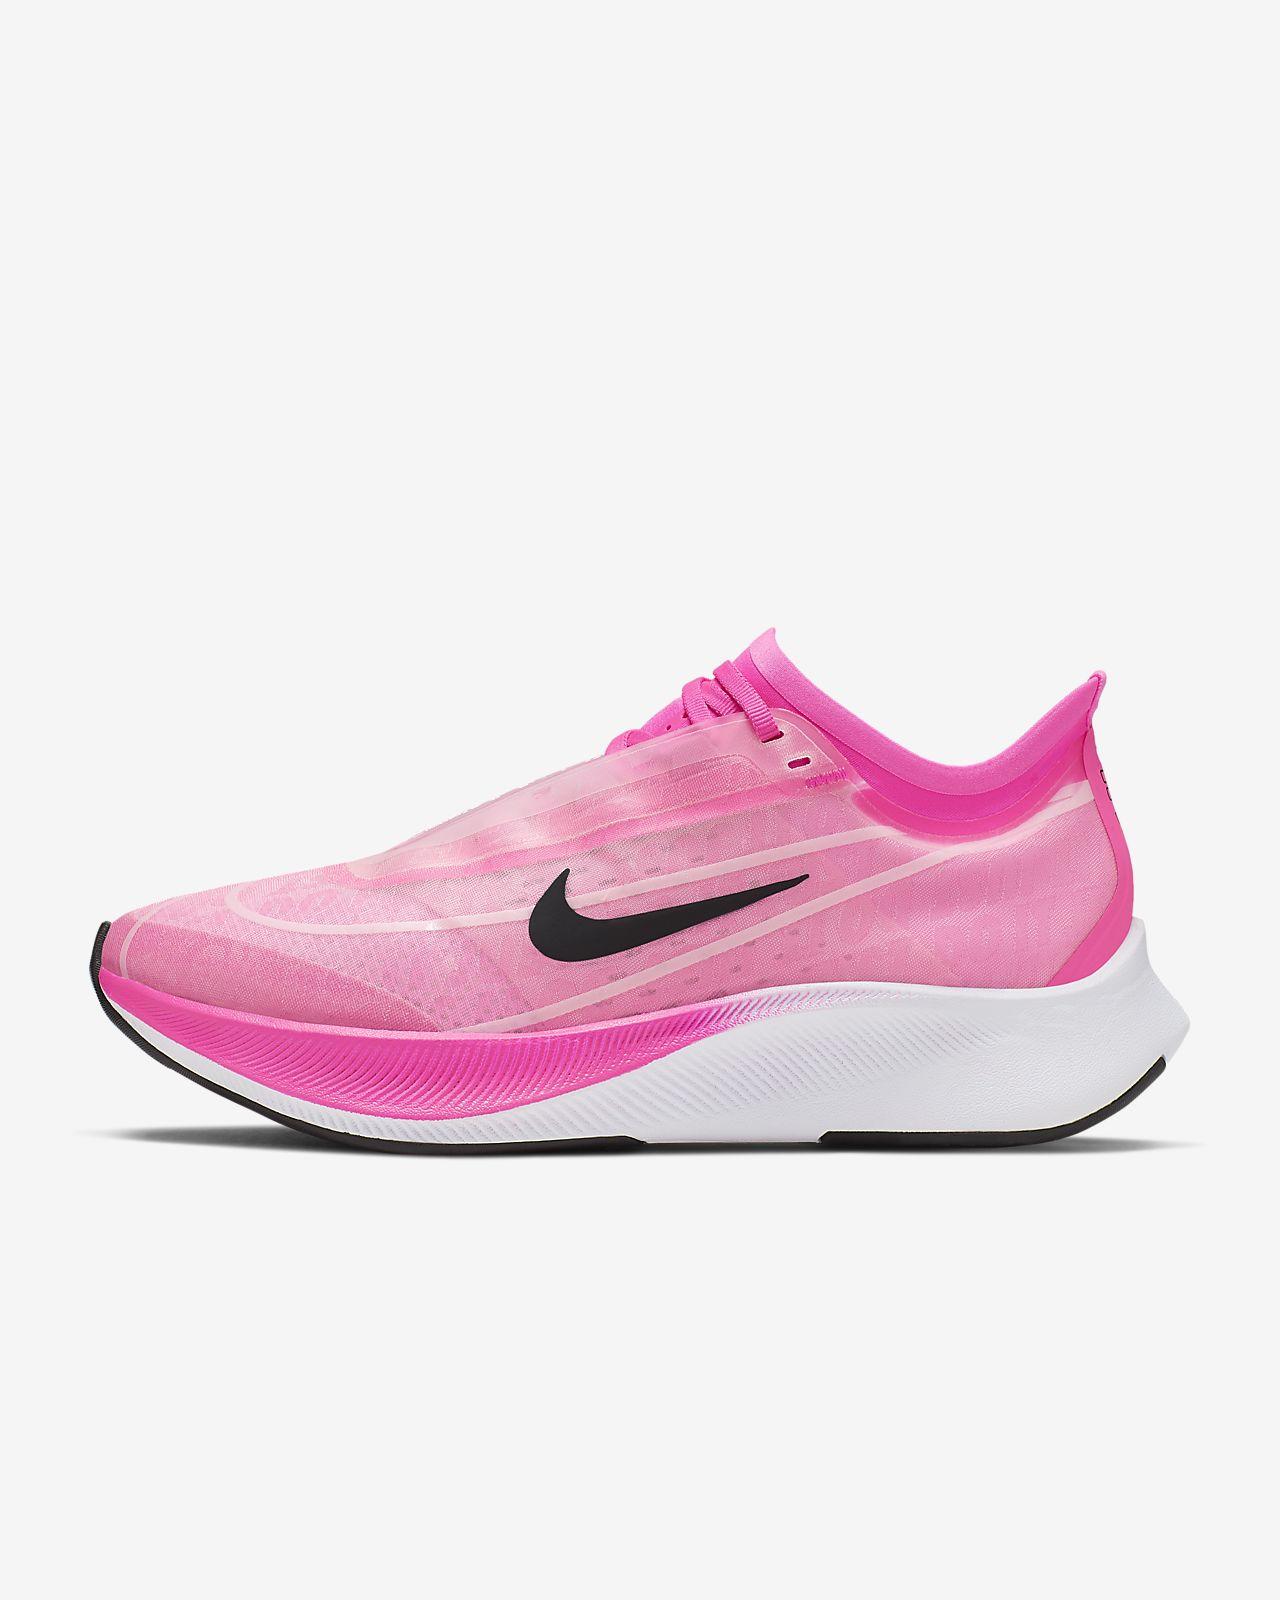 sale uk online retailer casual shoes Nike Zoom Fly 3 Women's Running Shoe